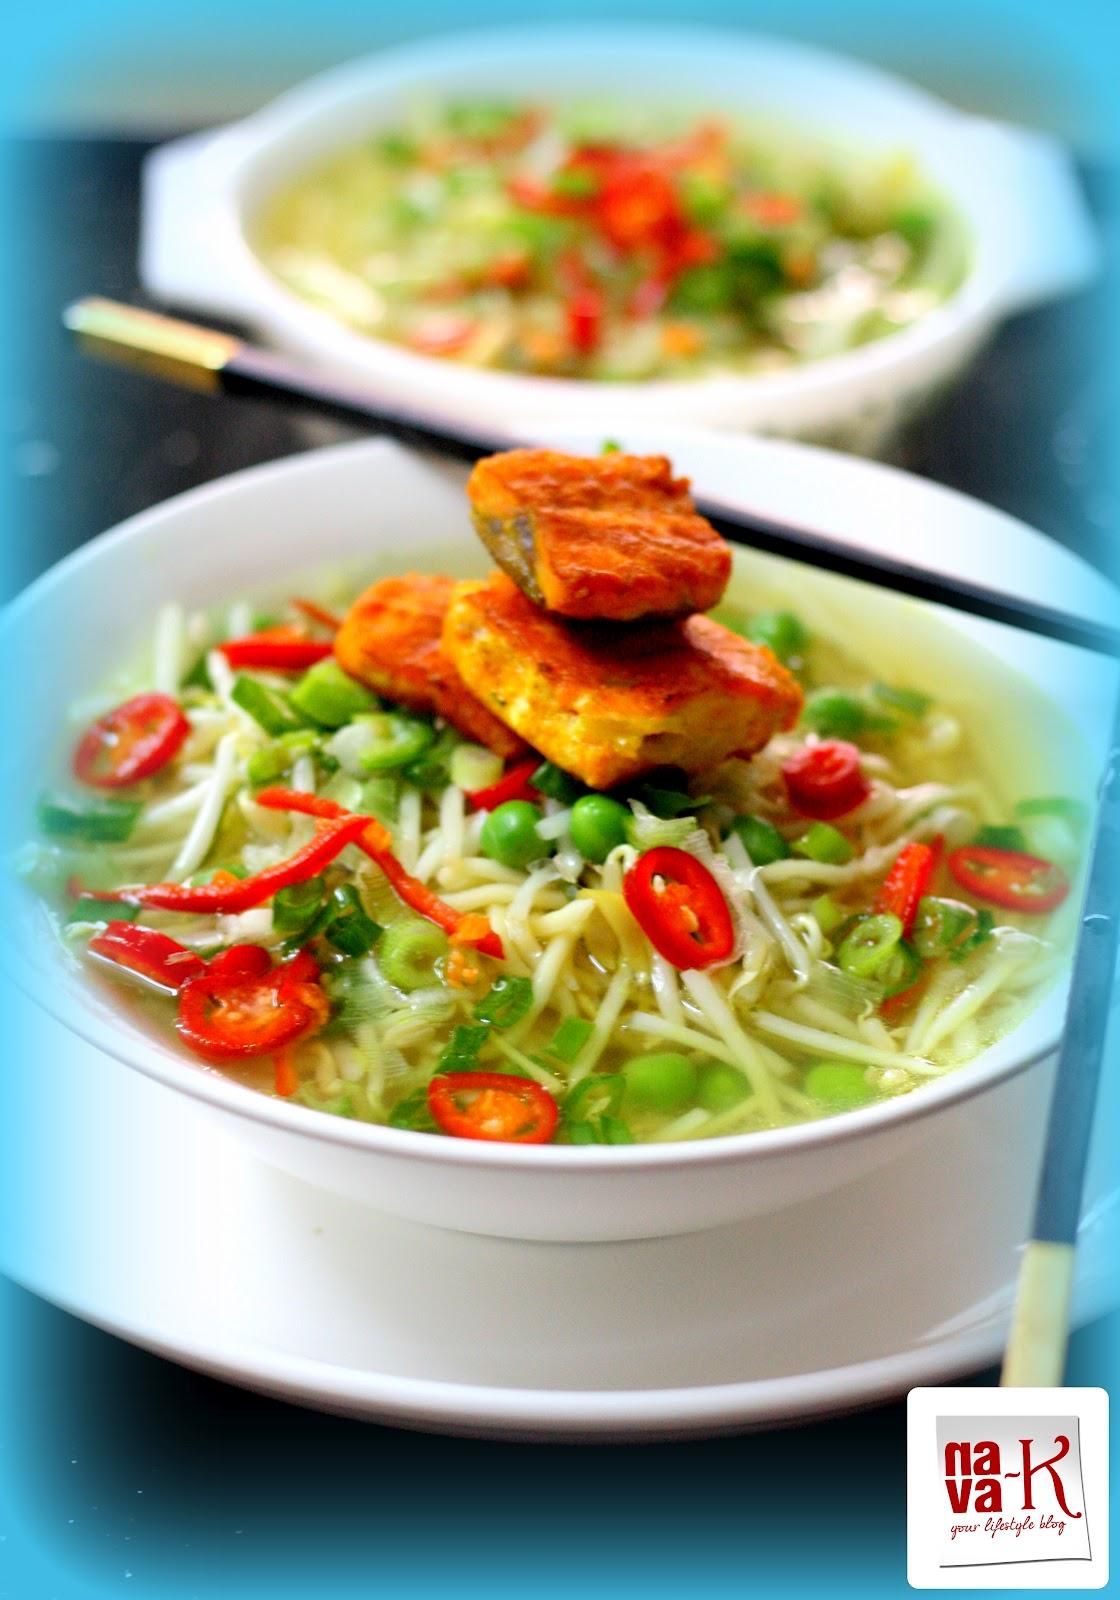 nava-k: Thai Salmon Noodle soup